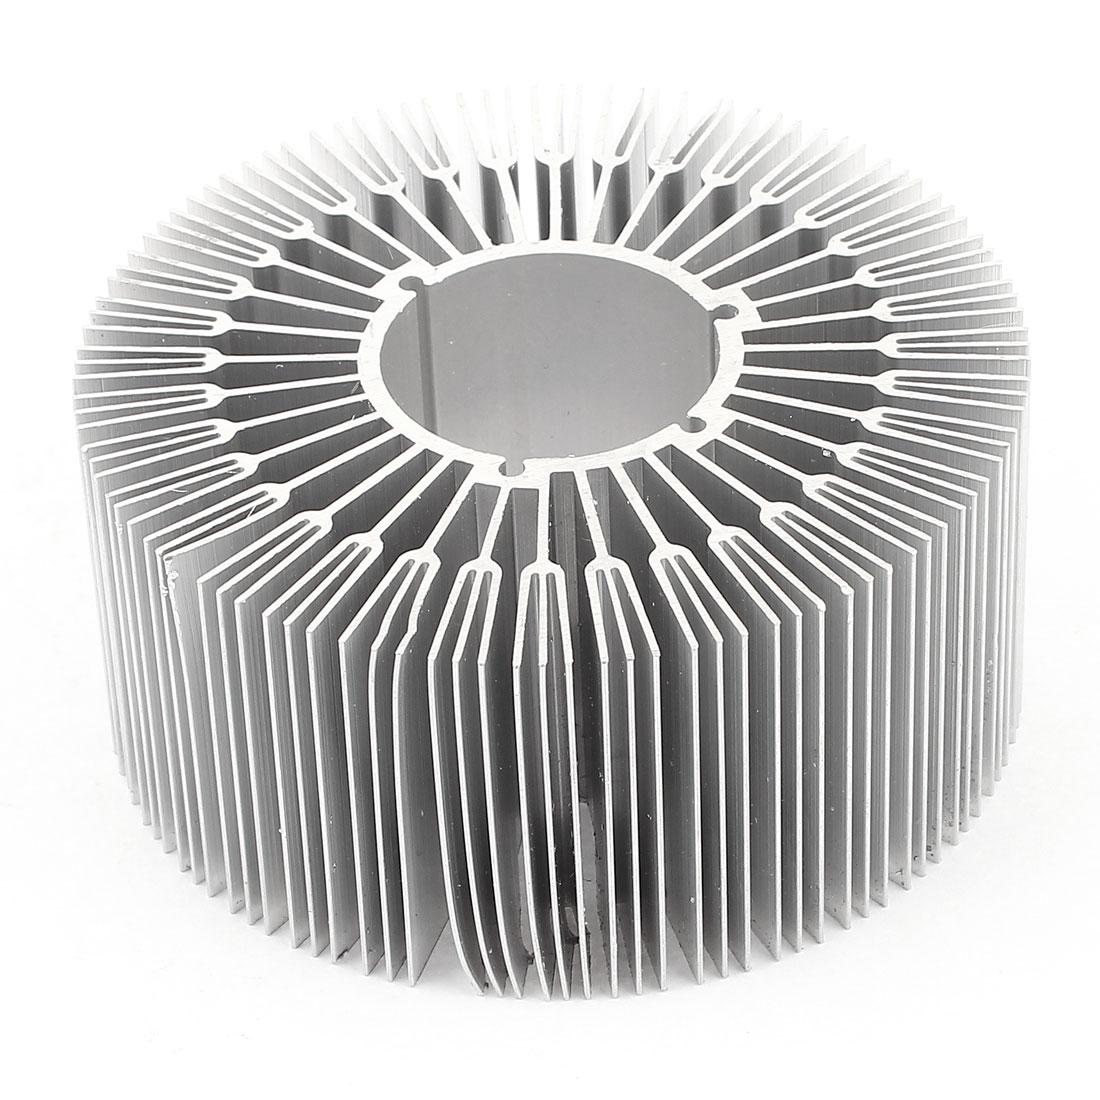 89mm x 40mm Cylinder 12W High Power LED Heatsink Aluminium Cooling Fin